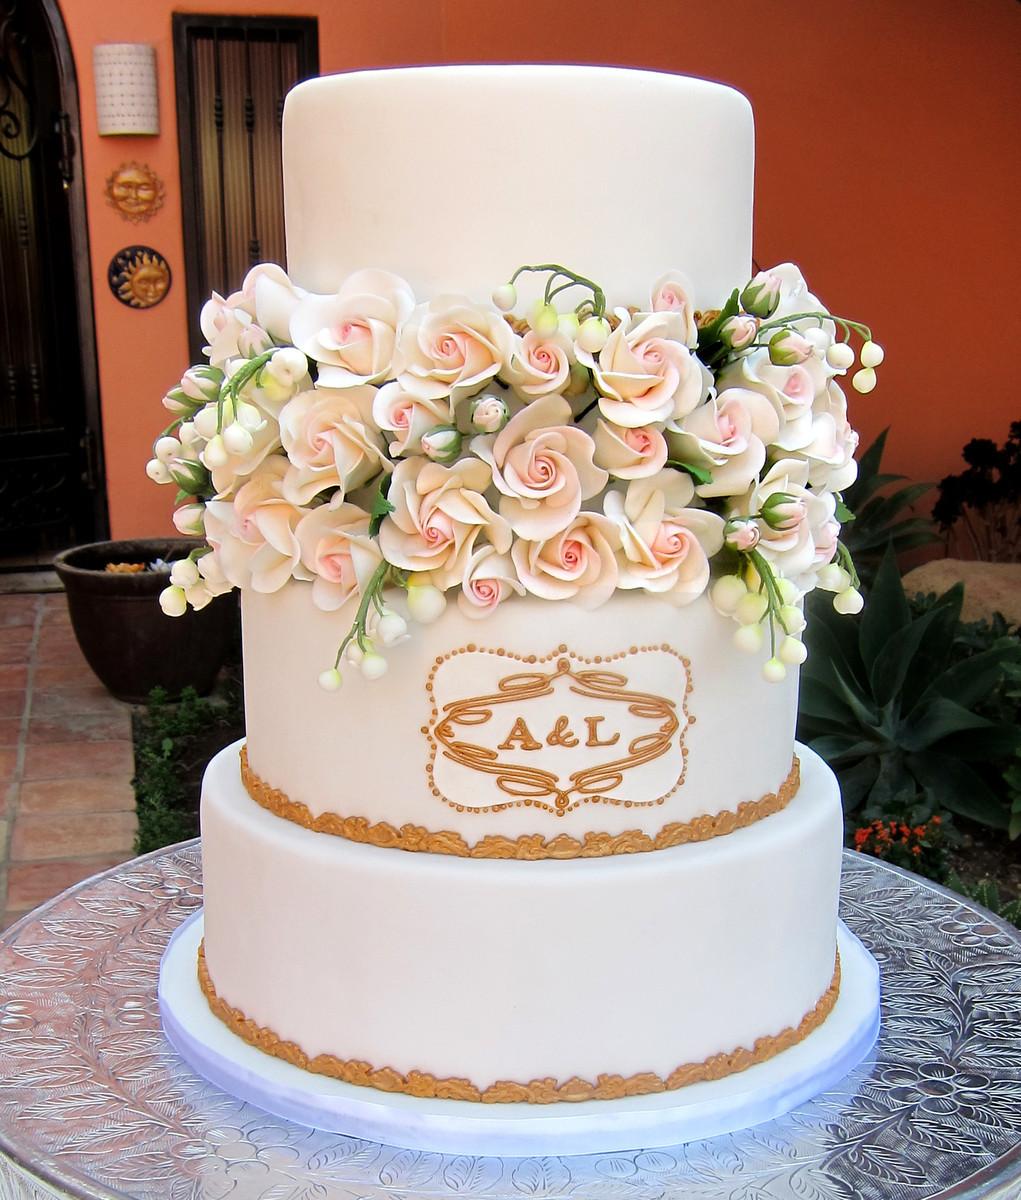 Wedding Cakes Ontario California  Delicious Arts Wedding Cake California Los Angeles